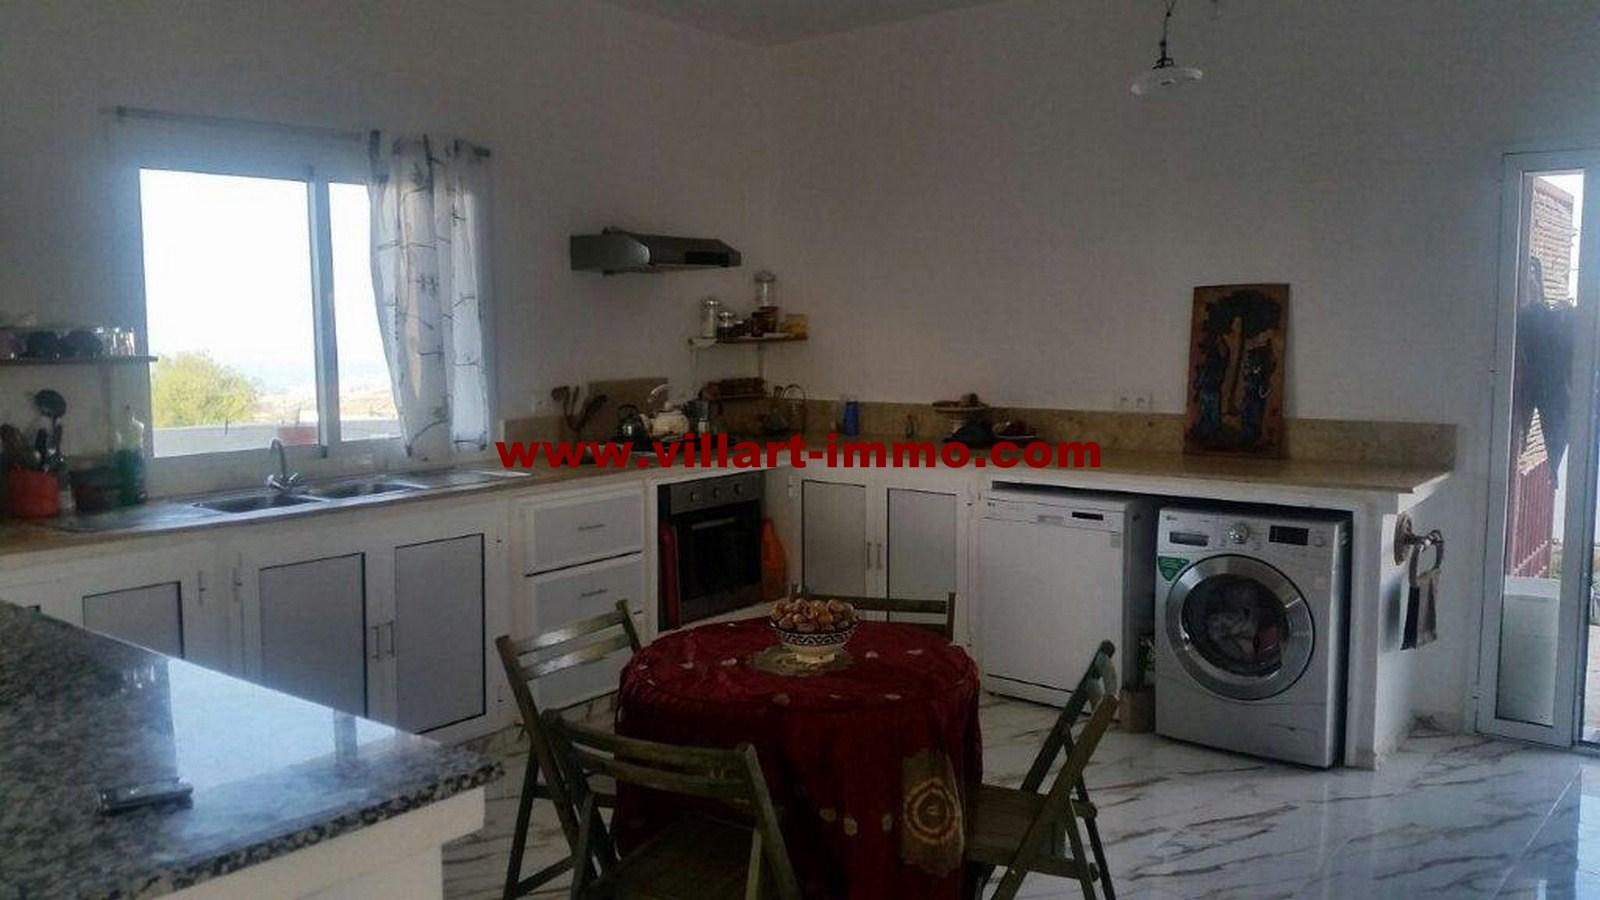 11-vente-villa-tanger-autres-cuisine-vv454-villart-immo